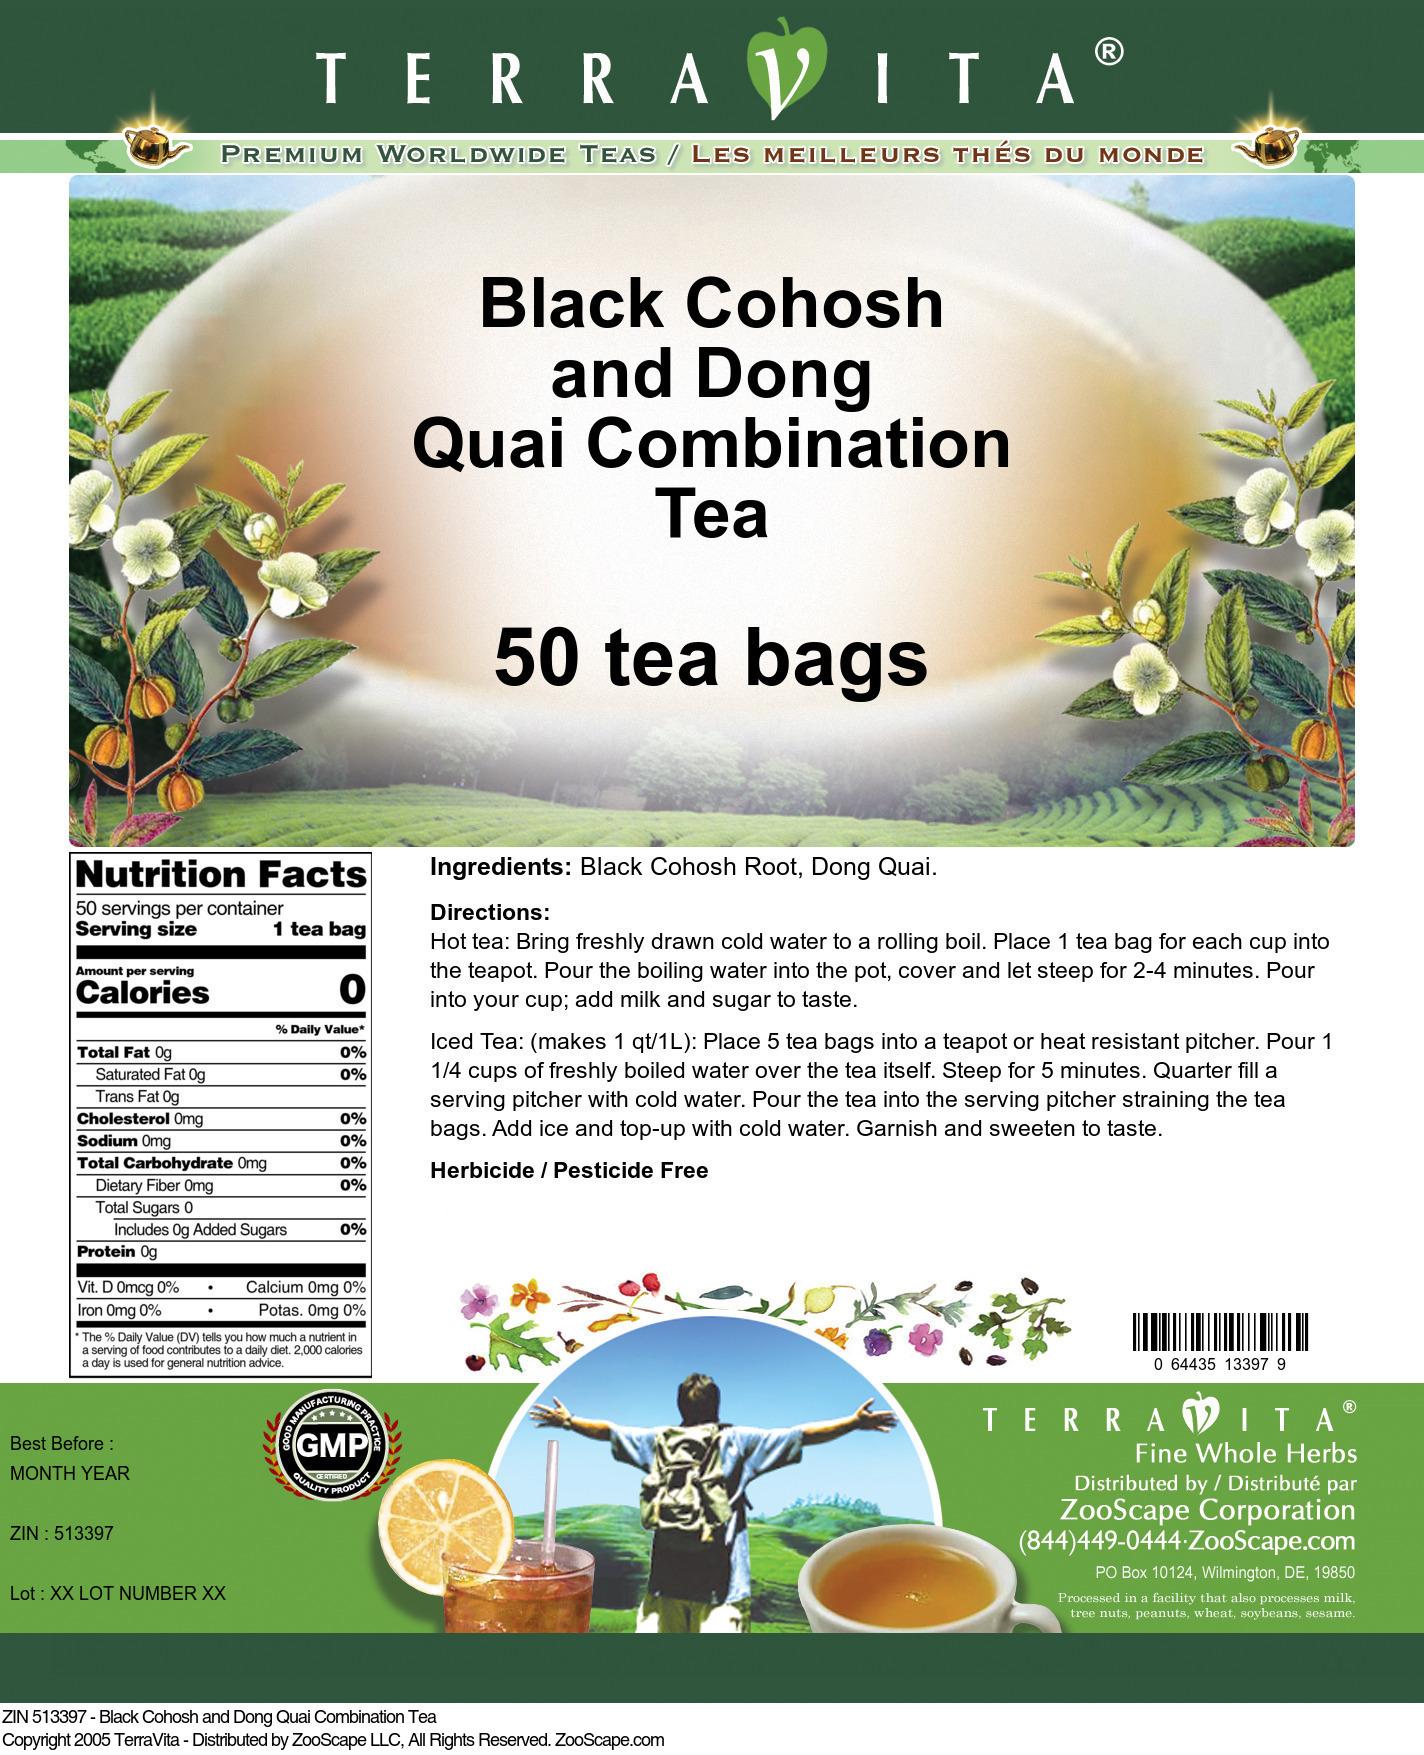 Black Cohosh and Dong Quai Combination Tea - Label